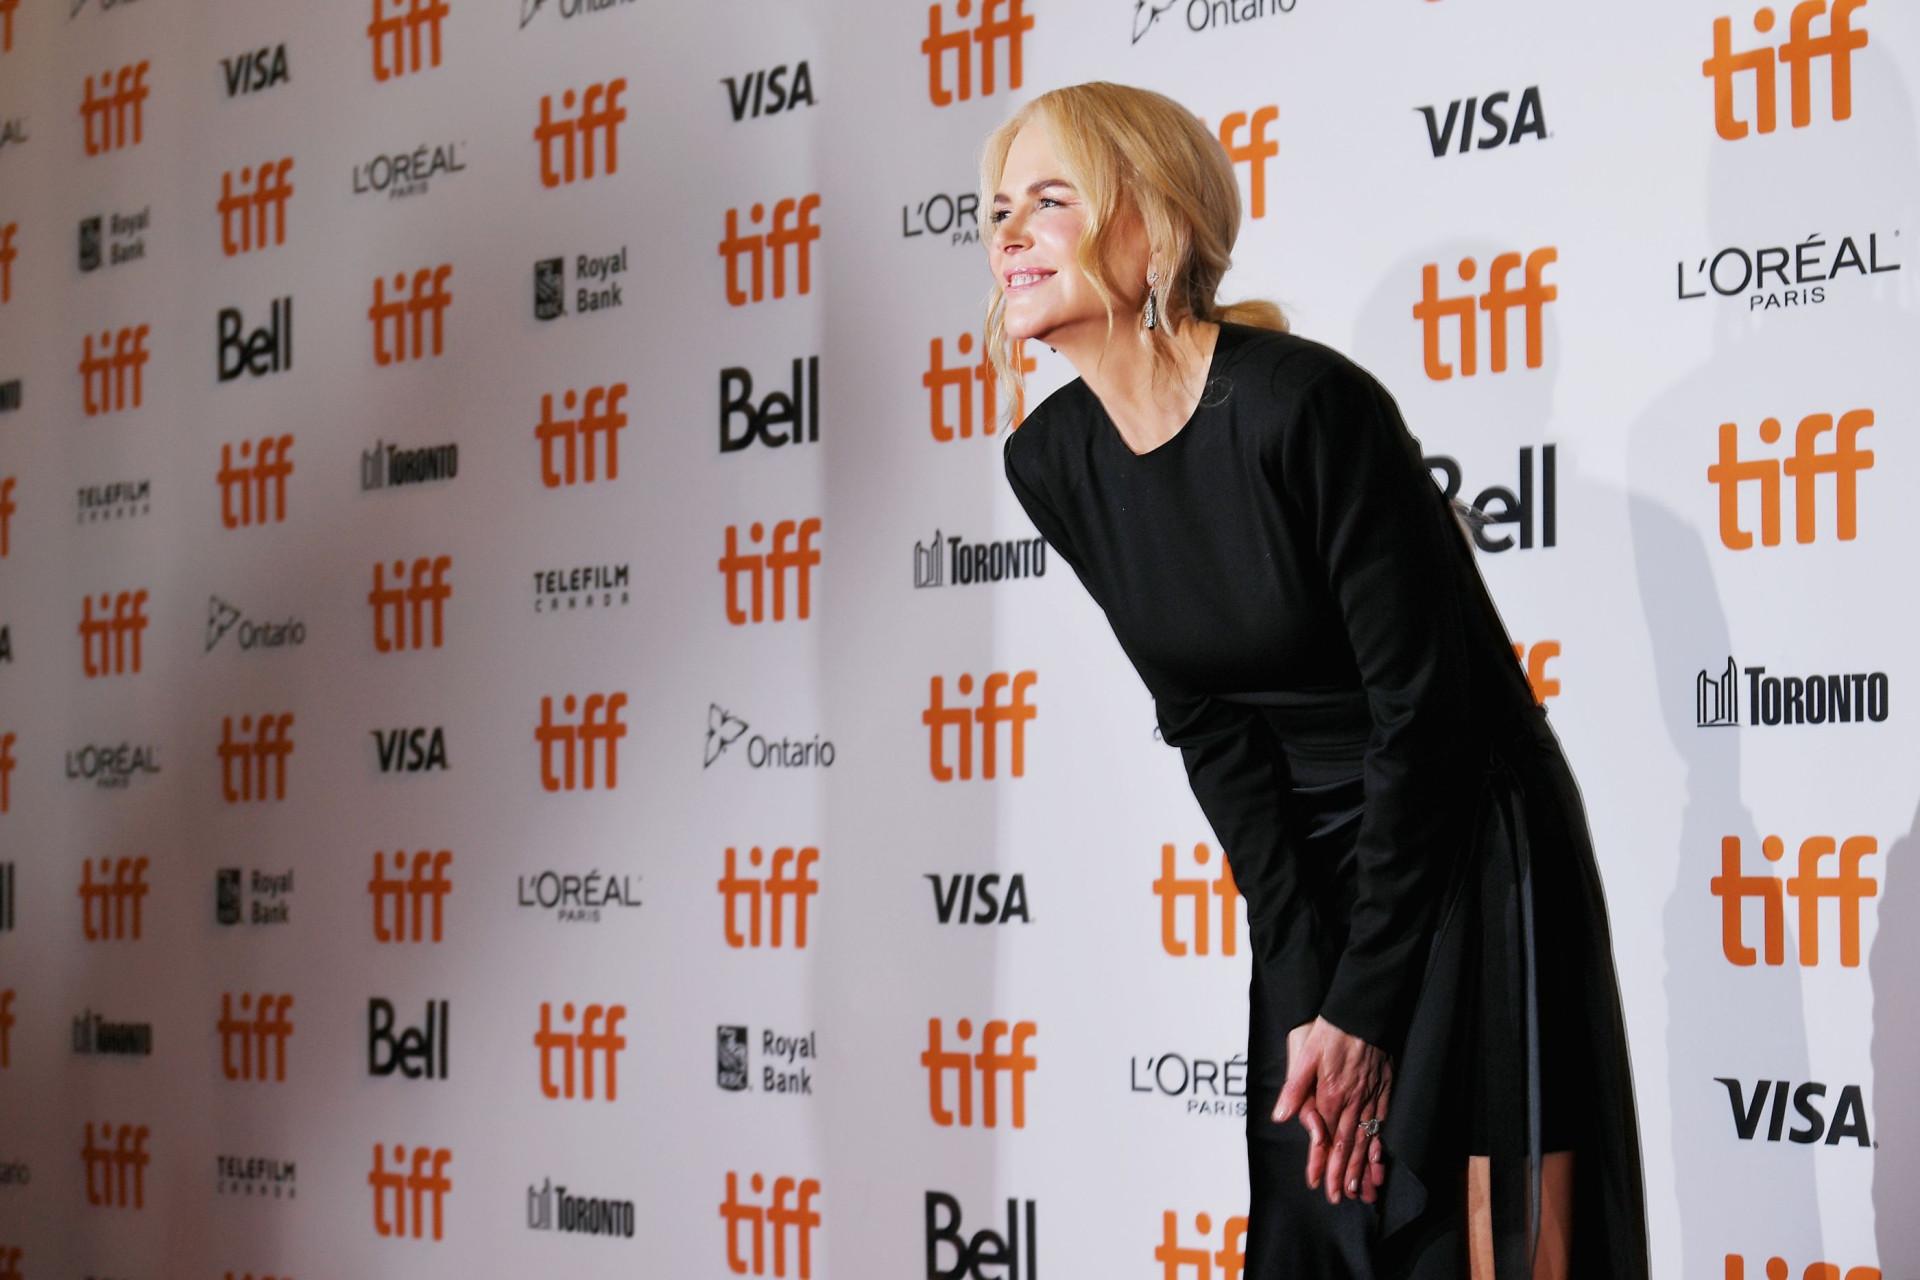 Botox? Eis a 'nova' cara de Nicole Kidman